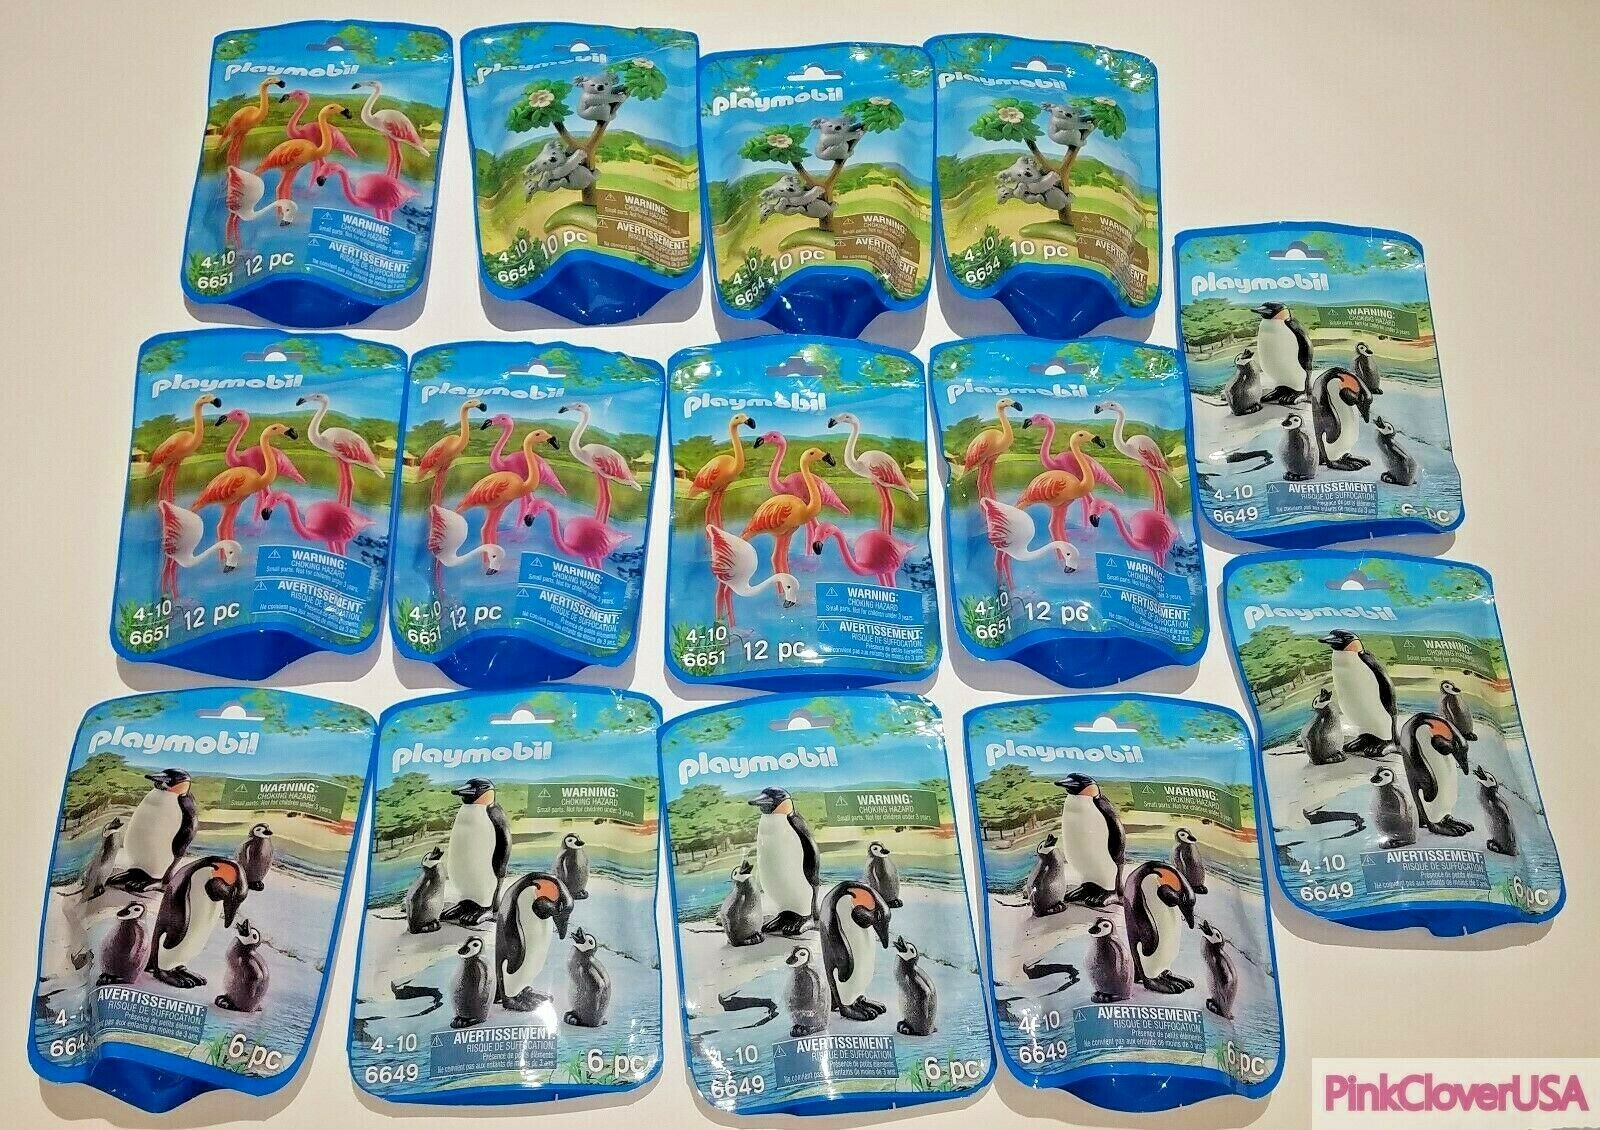 Bulk Lot of 14 NEW Playmobil Figurines - Koalas, Flamingos, Penguins, Ships Fast